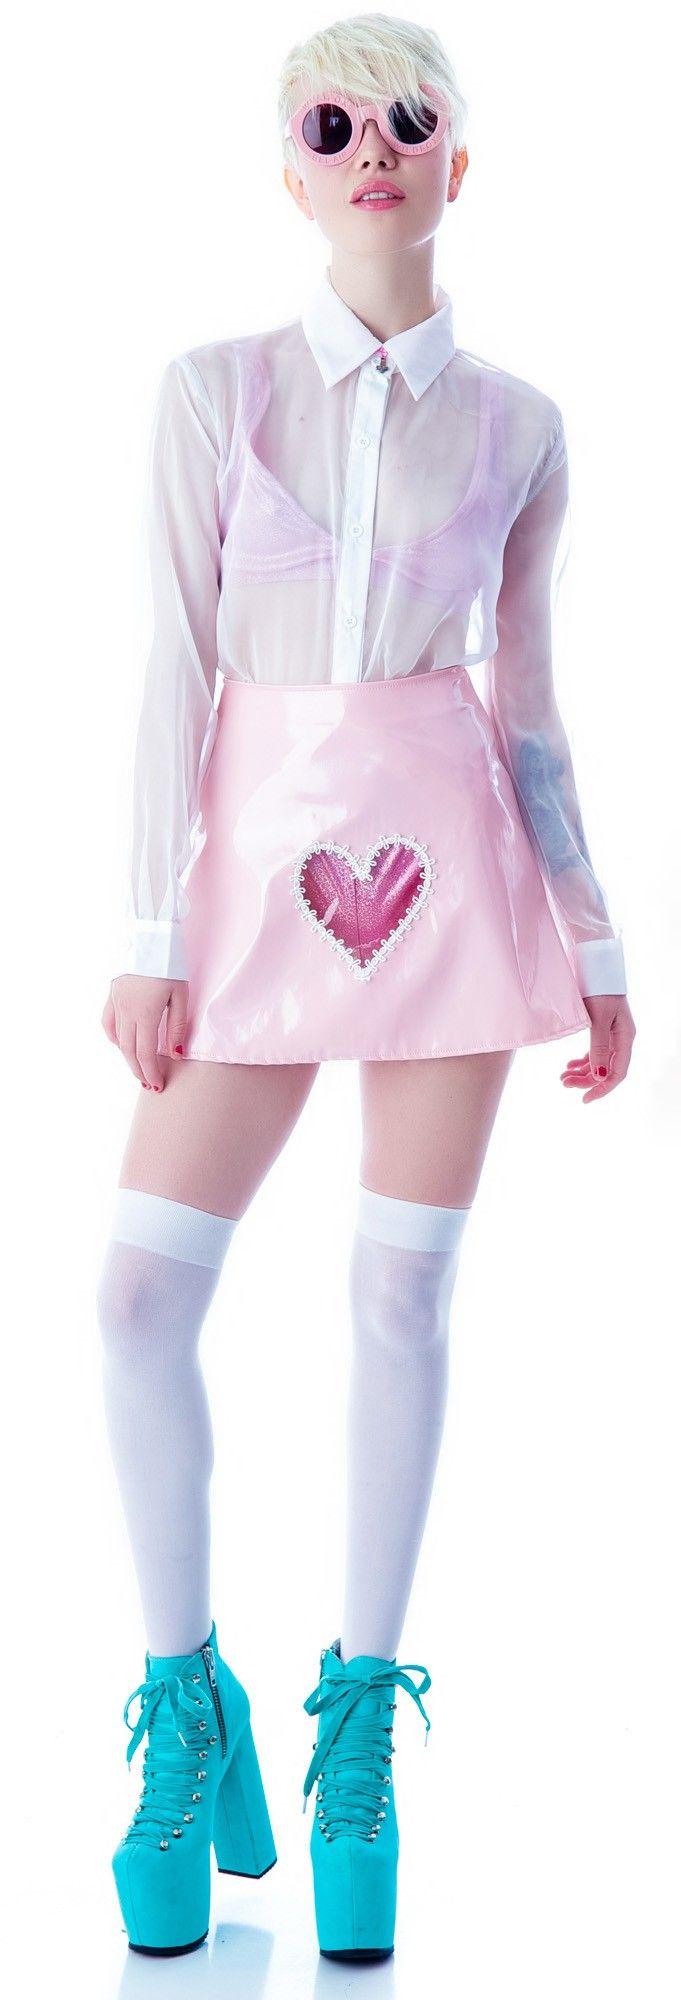 Jeannie Nitro Clear Heart Vinyl Skirt | Dolls Kill